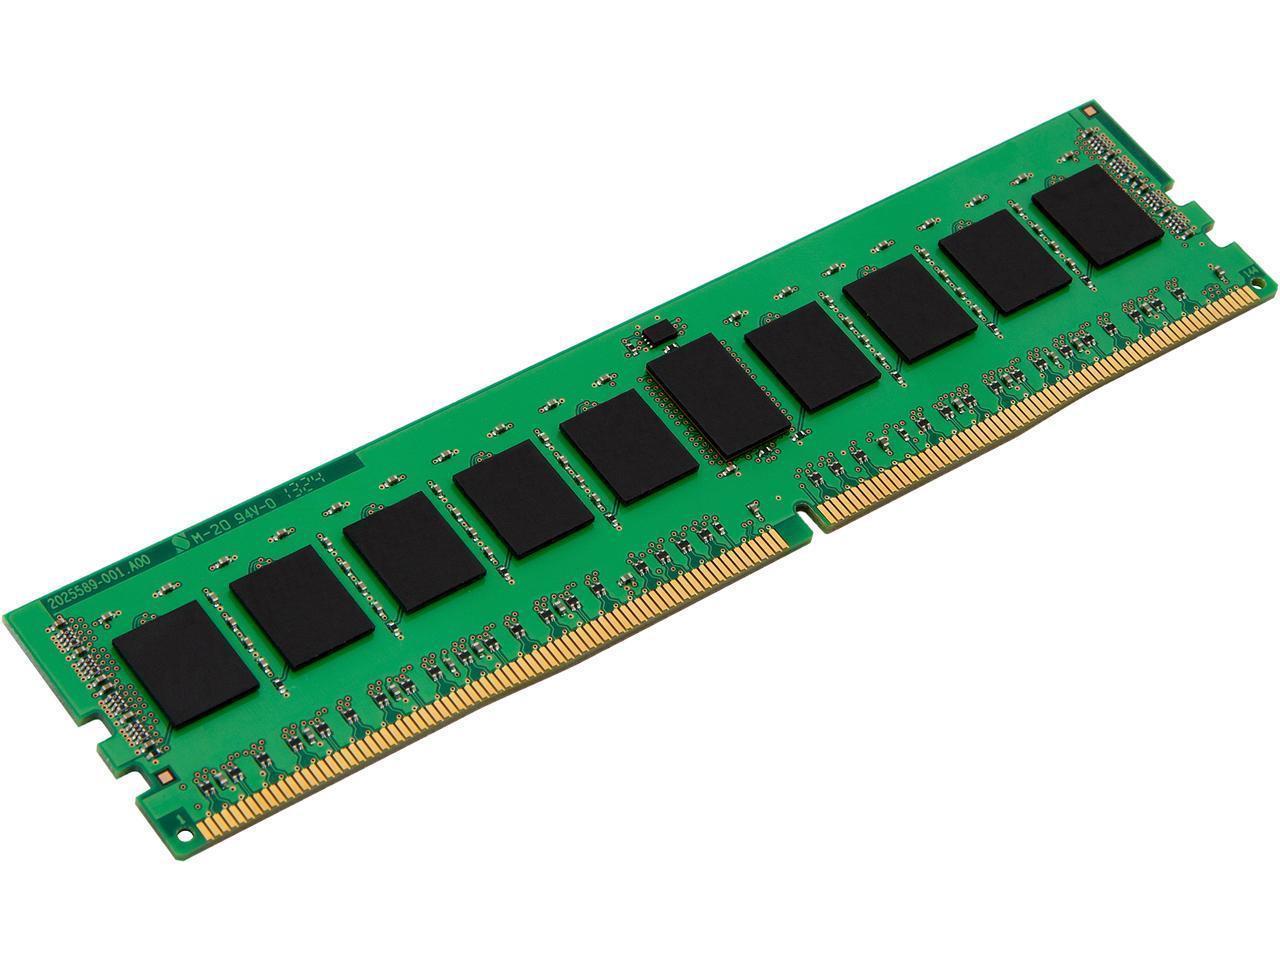 Памет Kingston 16GB DDR4 PC4-25600 3200MHz CL22 KVR32N22S8/16